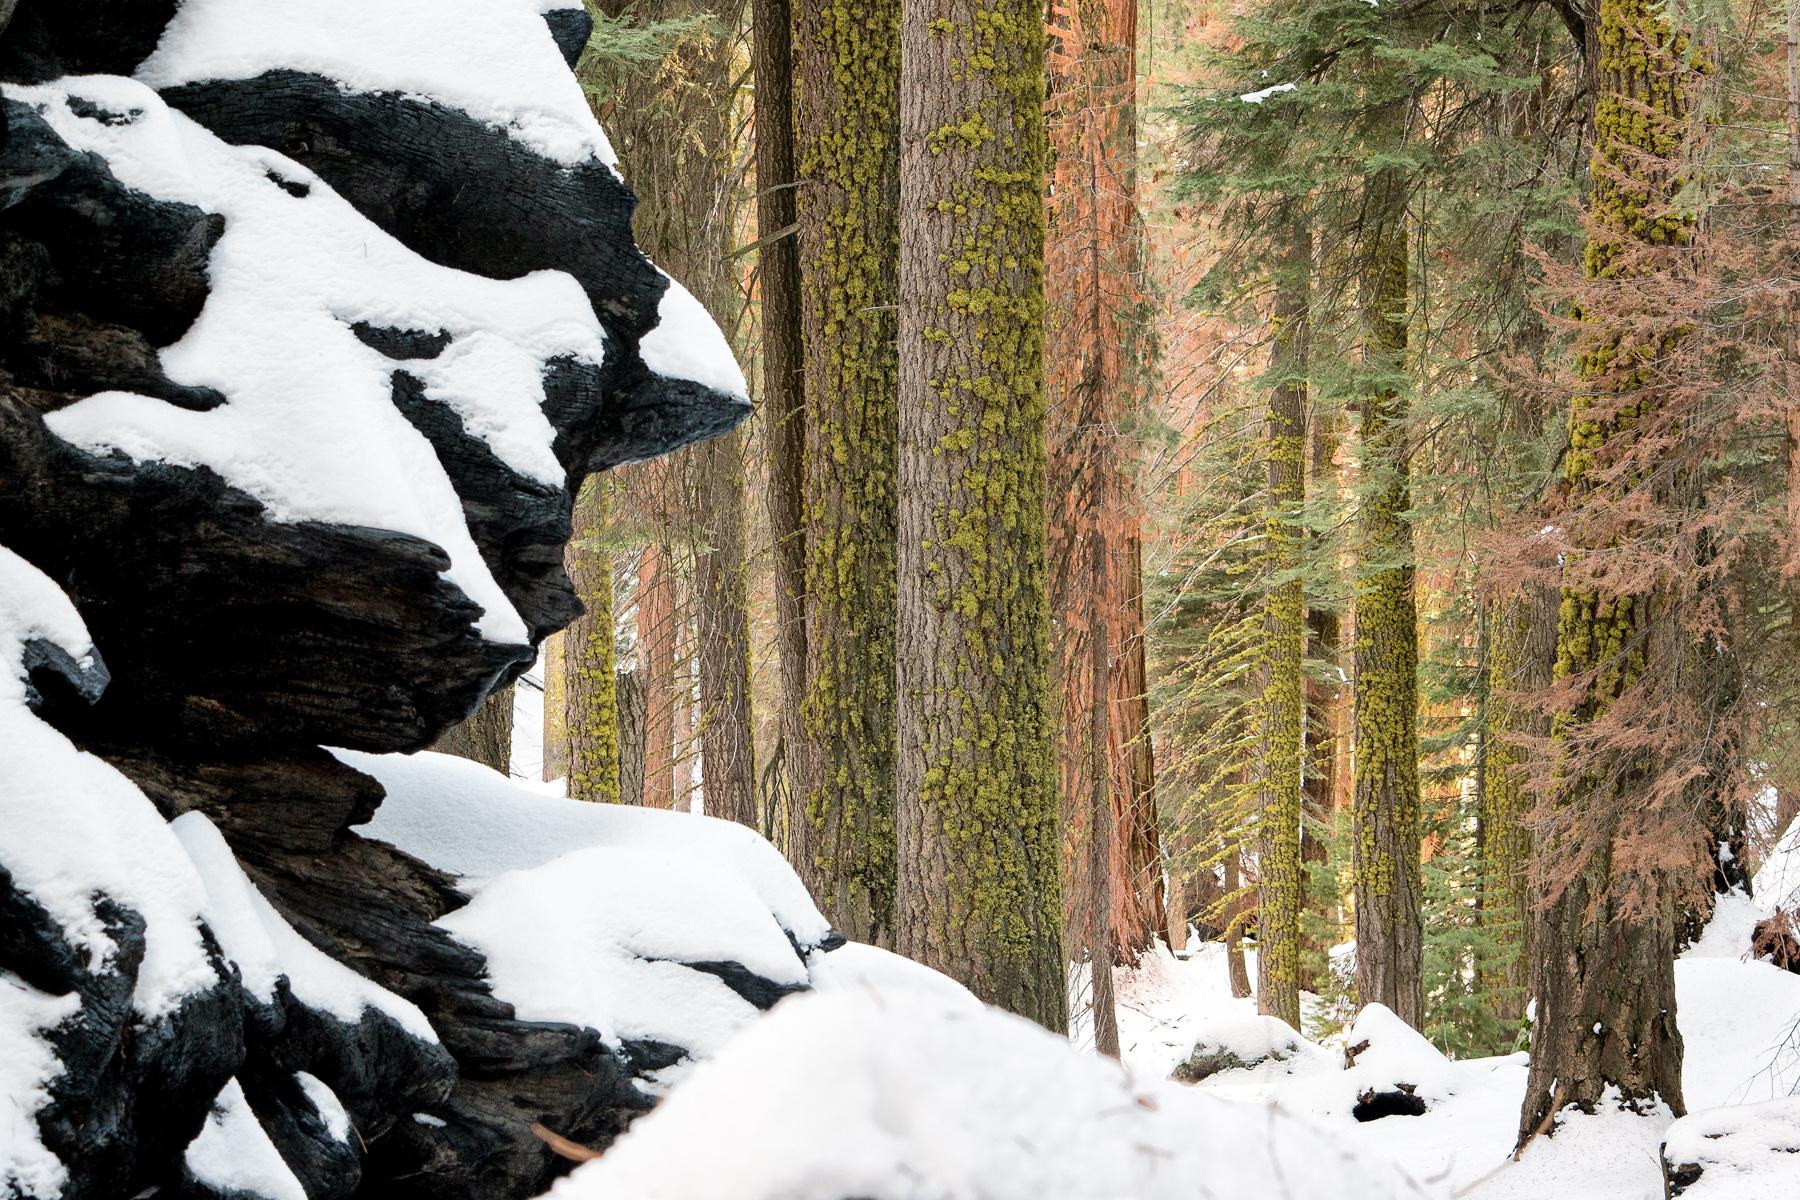 Wasim Muklashy Photography_Sequoia National Park_California_December 2015_-SAM_4048-Edit.jpg